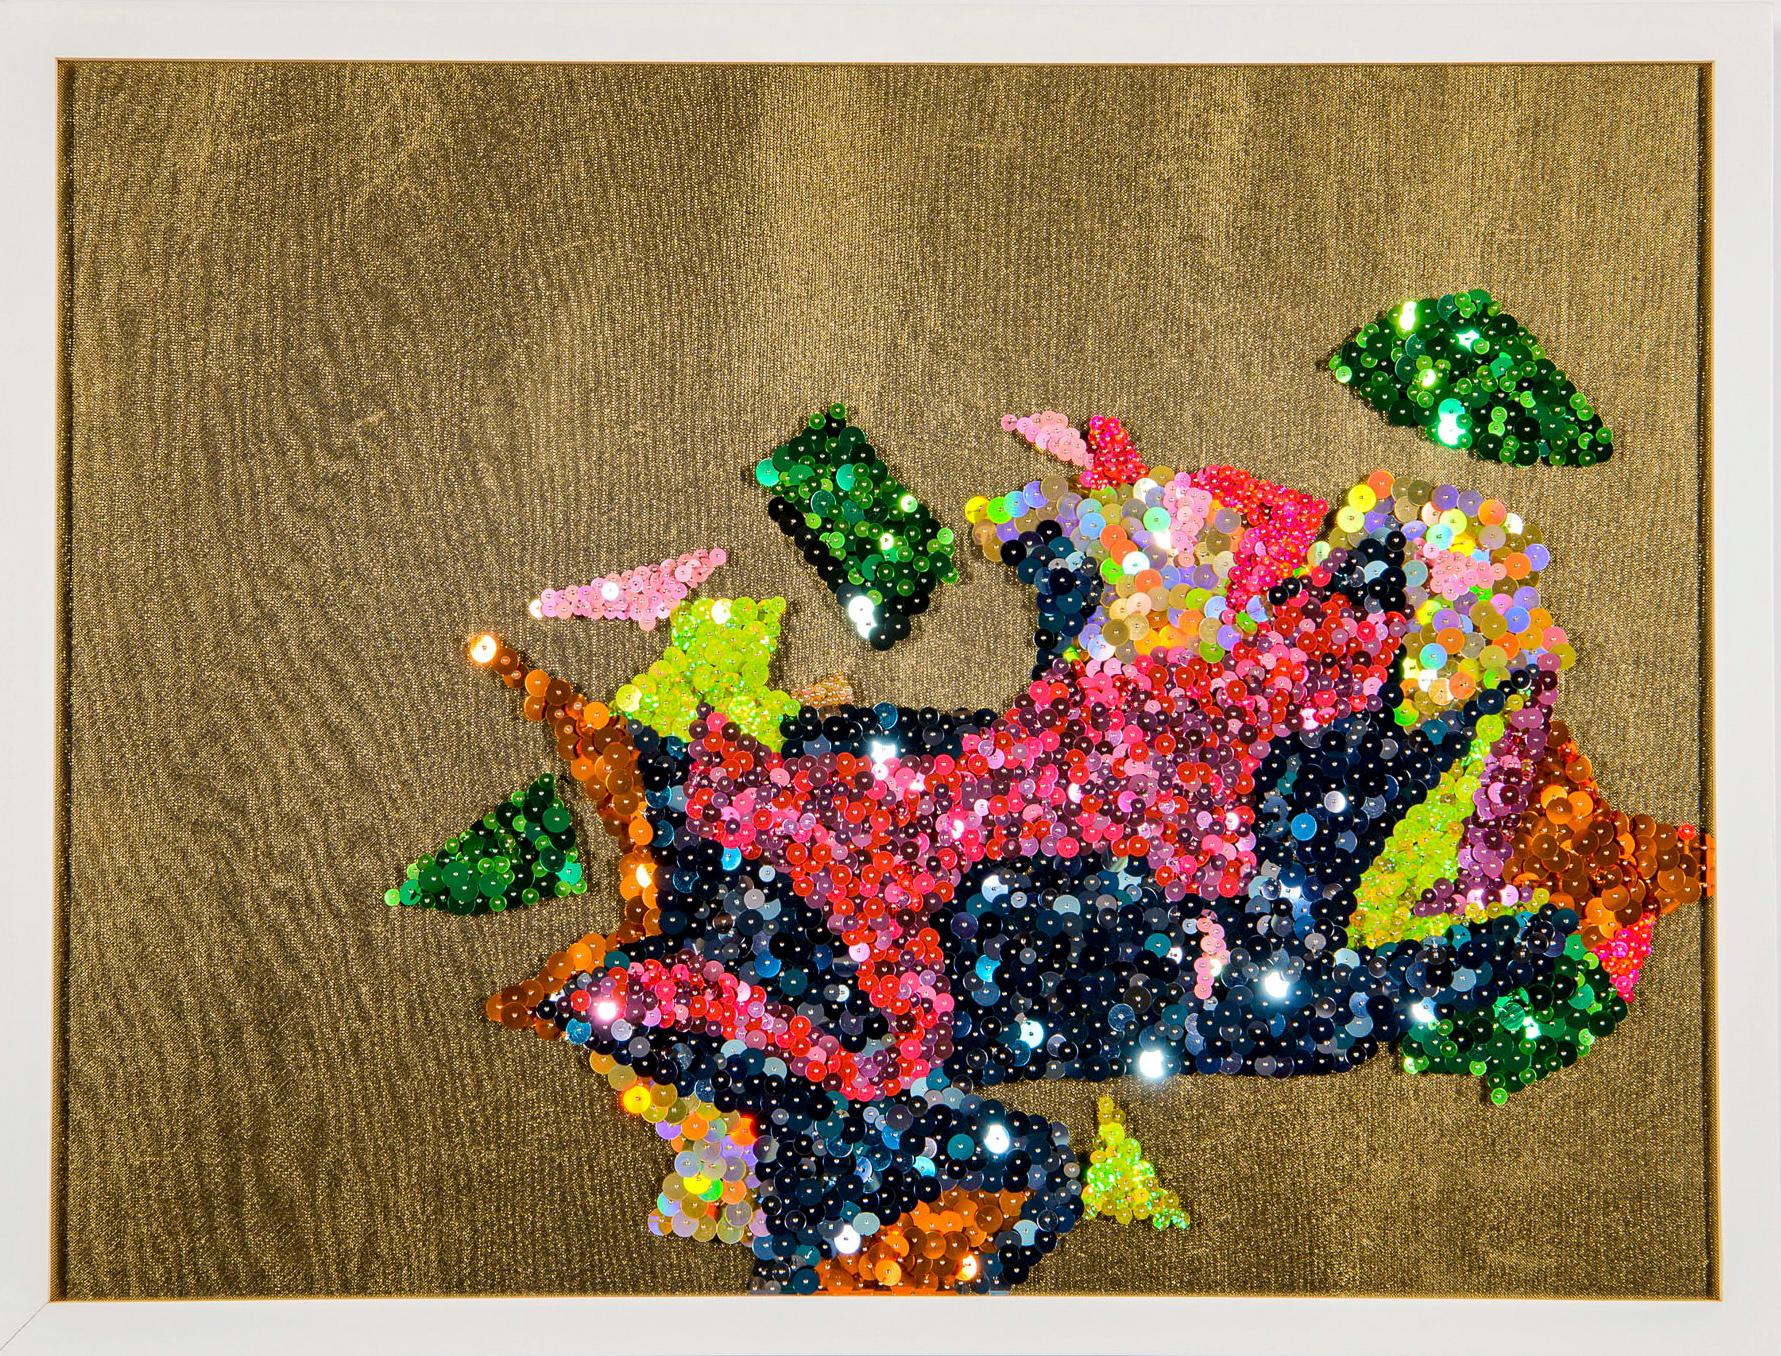 Fragmented Flowers (glimmer) 1